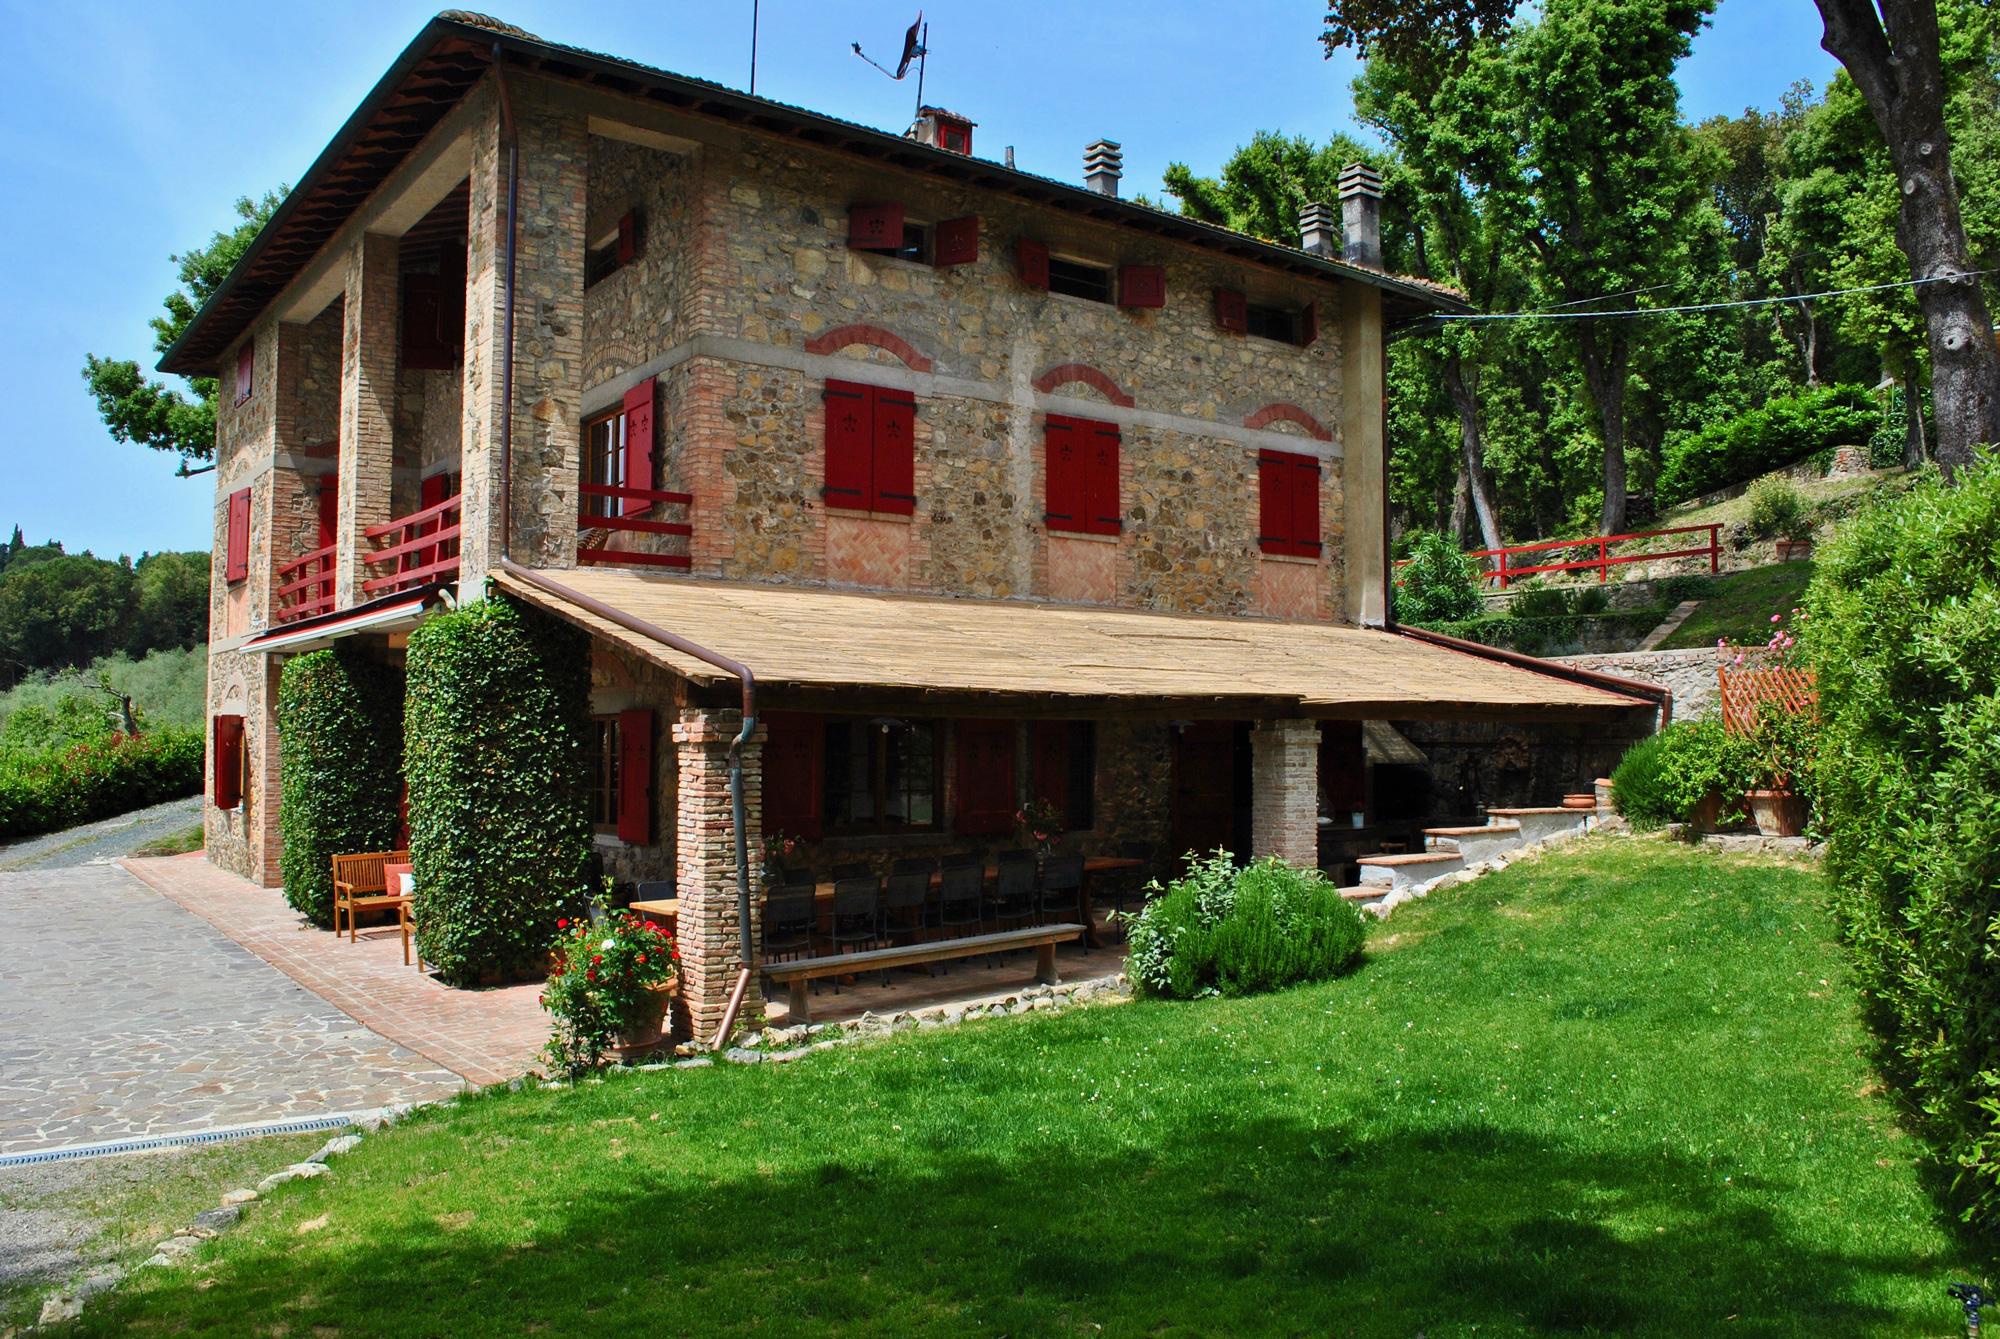 http://www.villalasciolta.it/wp-content/uploads/2016/02/villa-la-sciolta-tuscany5.jpg